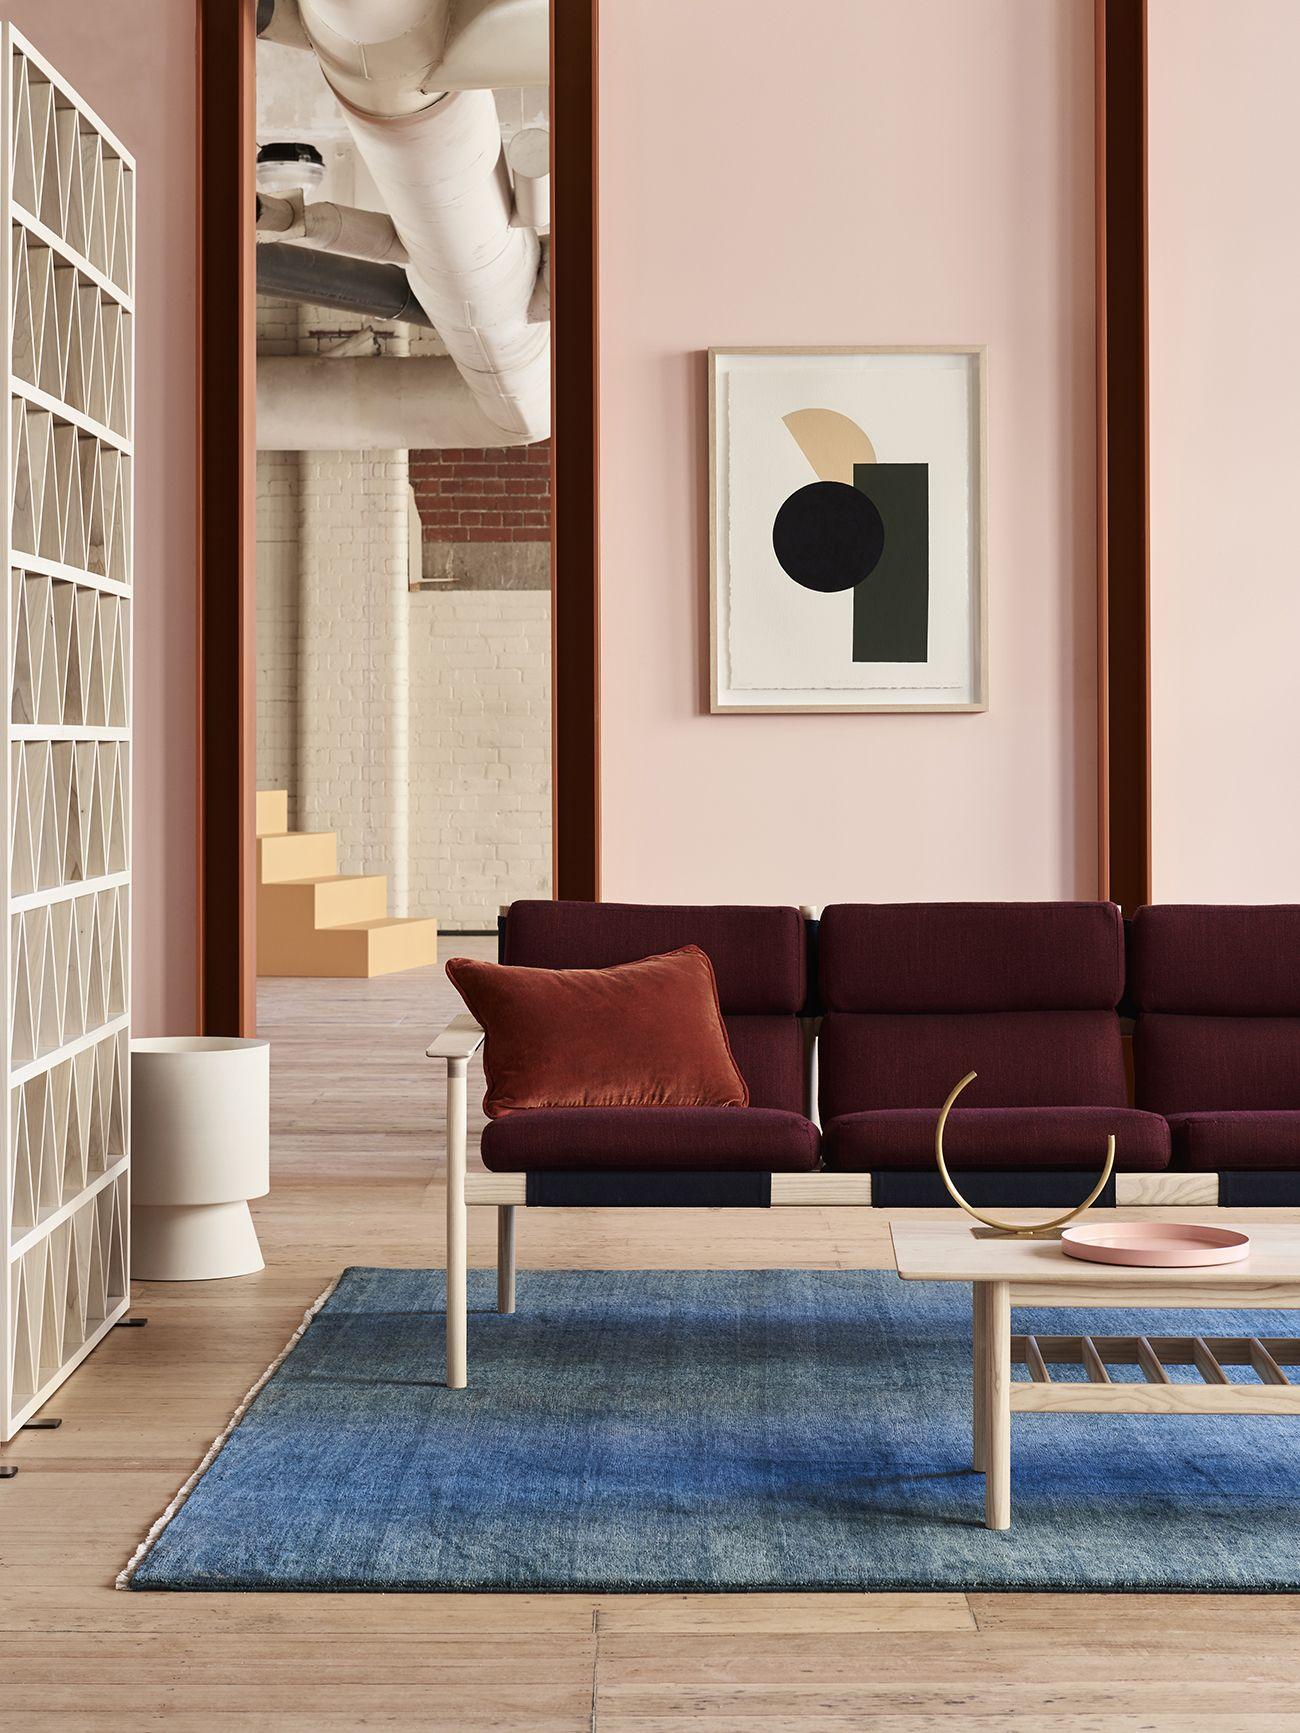 The Design Files Open House 2017 | Interiors | Pinterest | Diy möbel ...